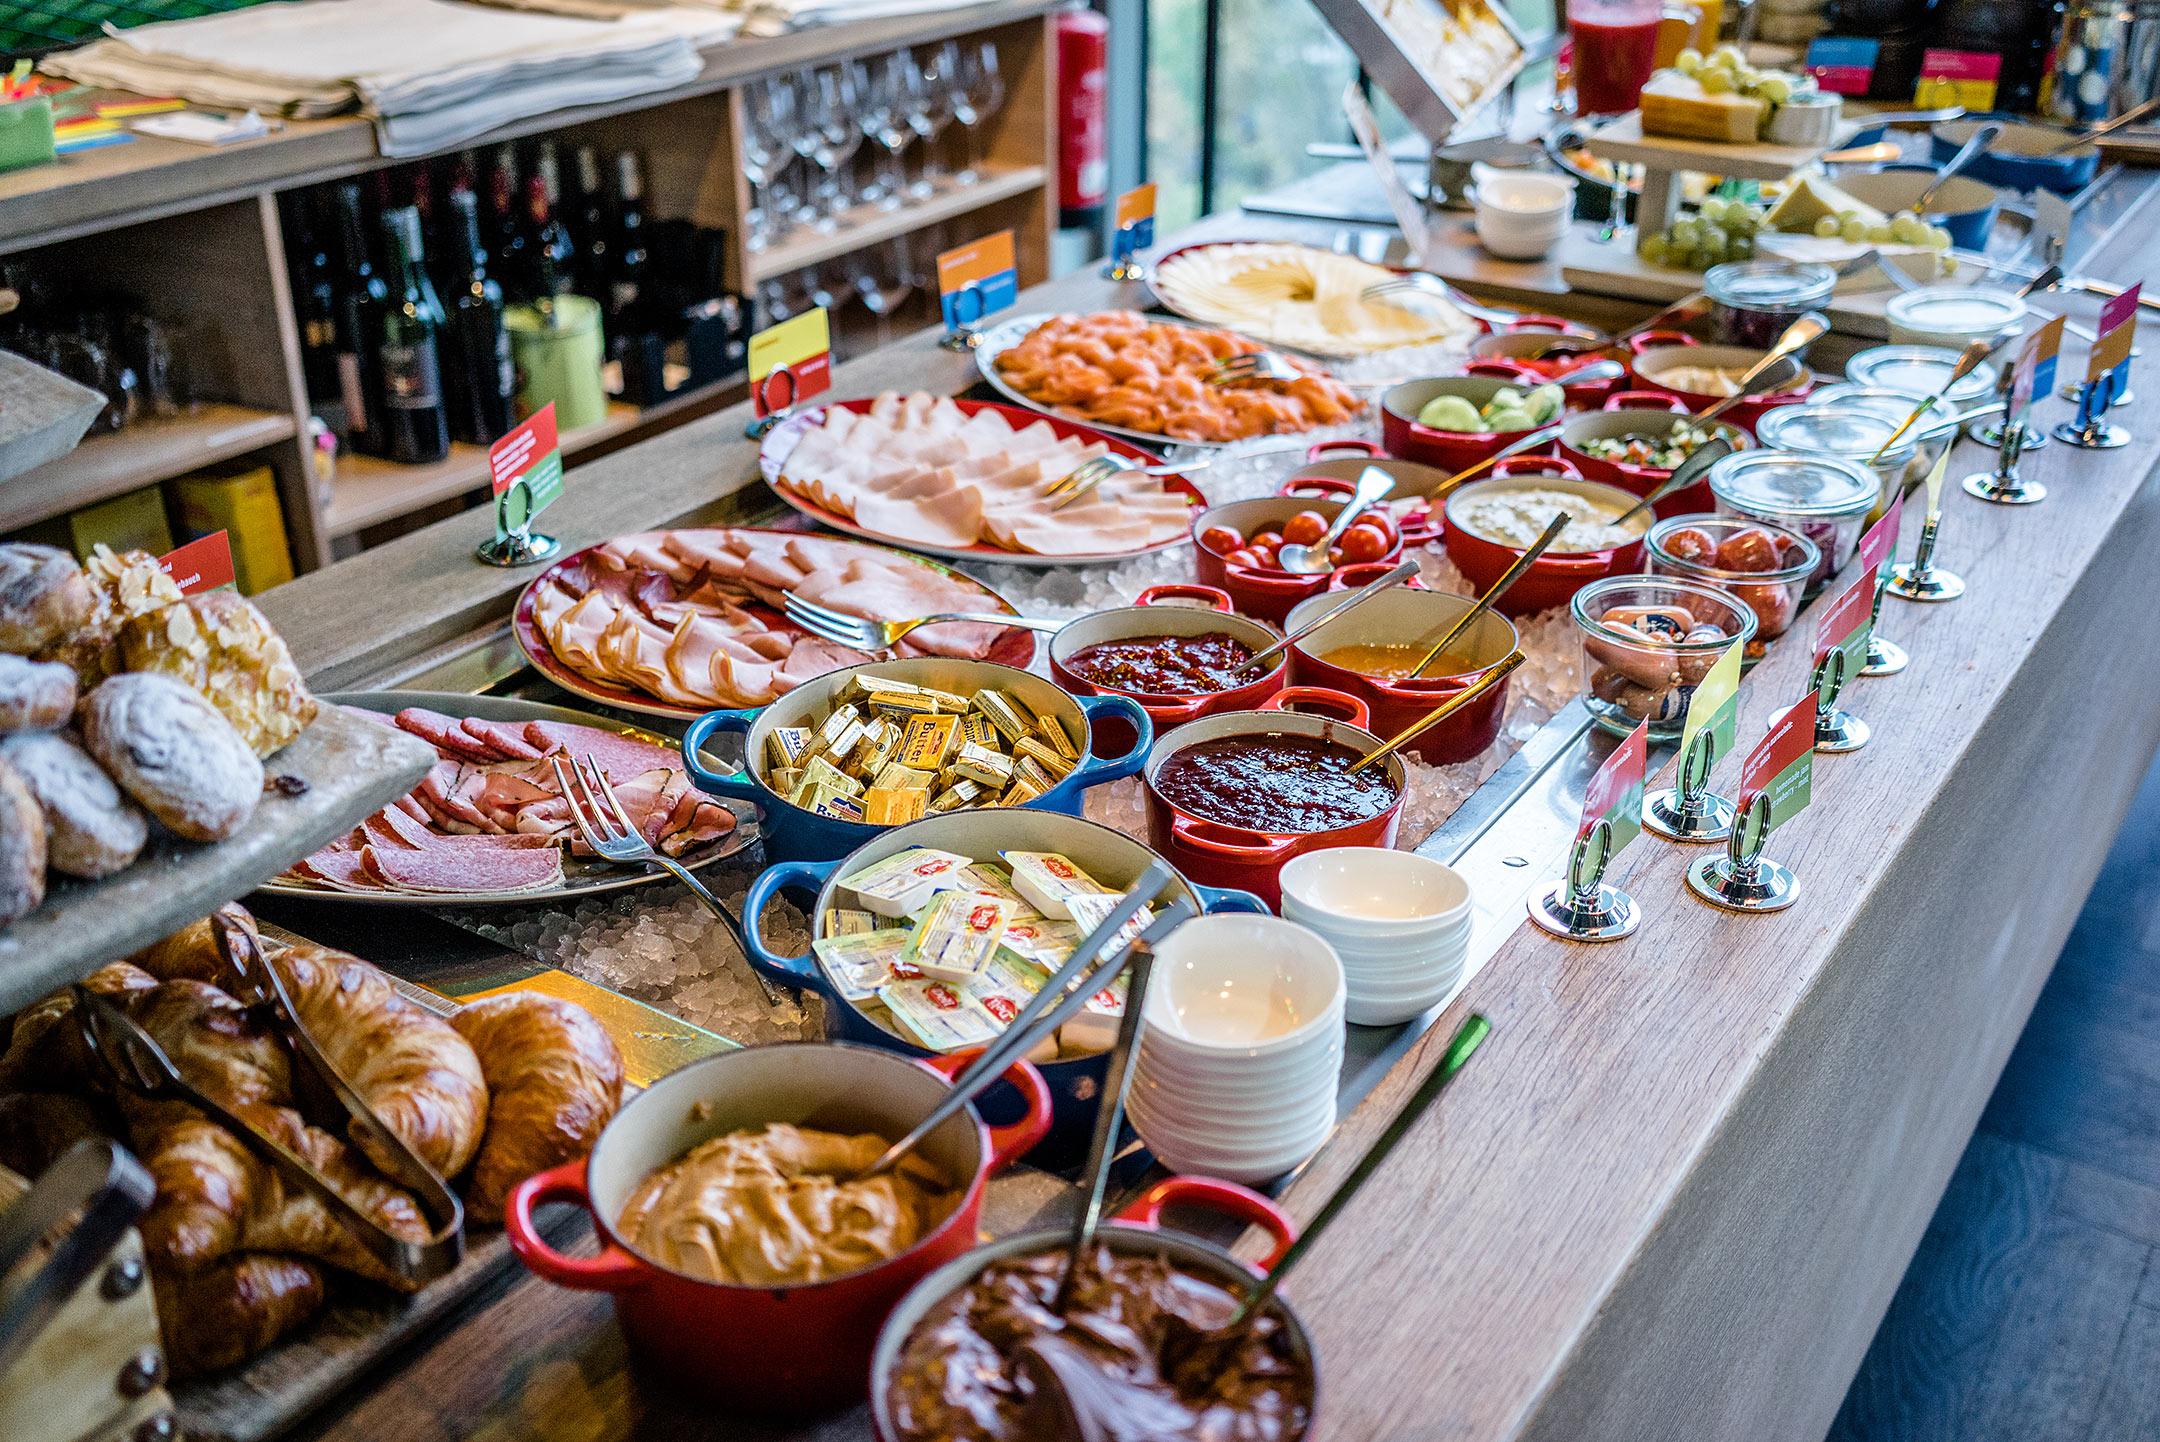 25hours Hotel Bikini Berlin Frühstück Breakfast Travel Blog Sunnyinga